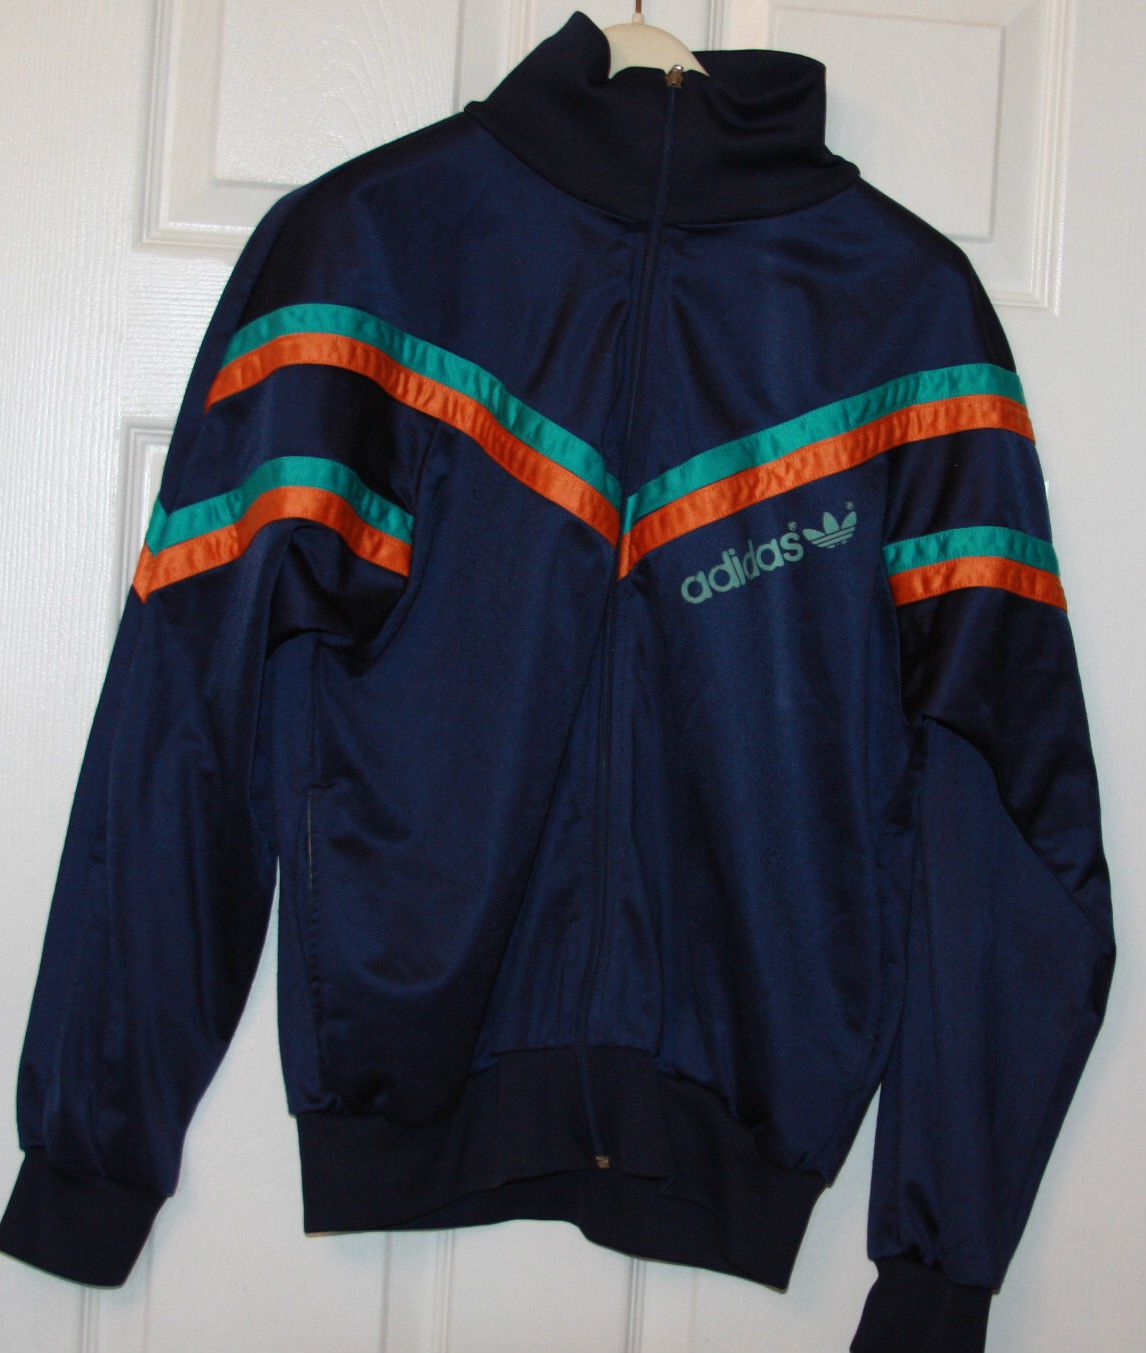 True Vintage 1980s 1990s Adidas